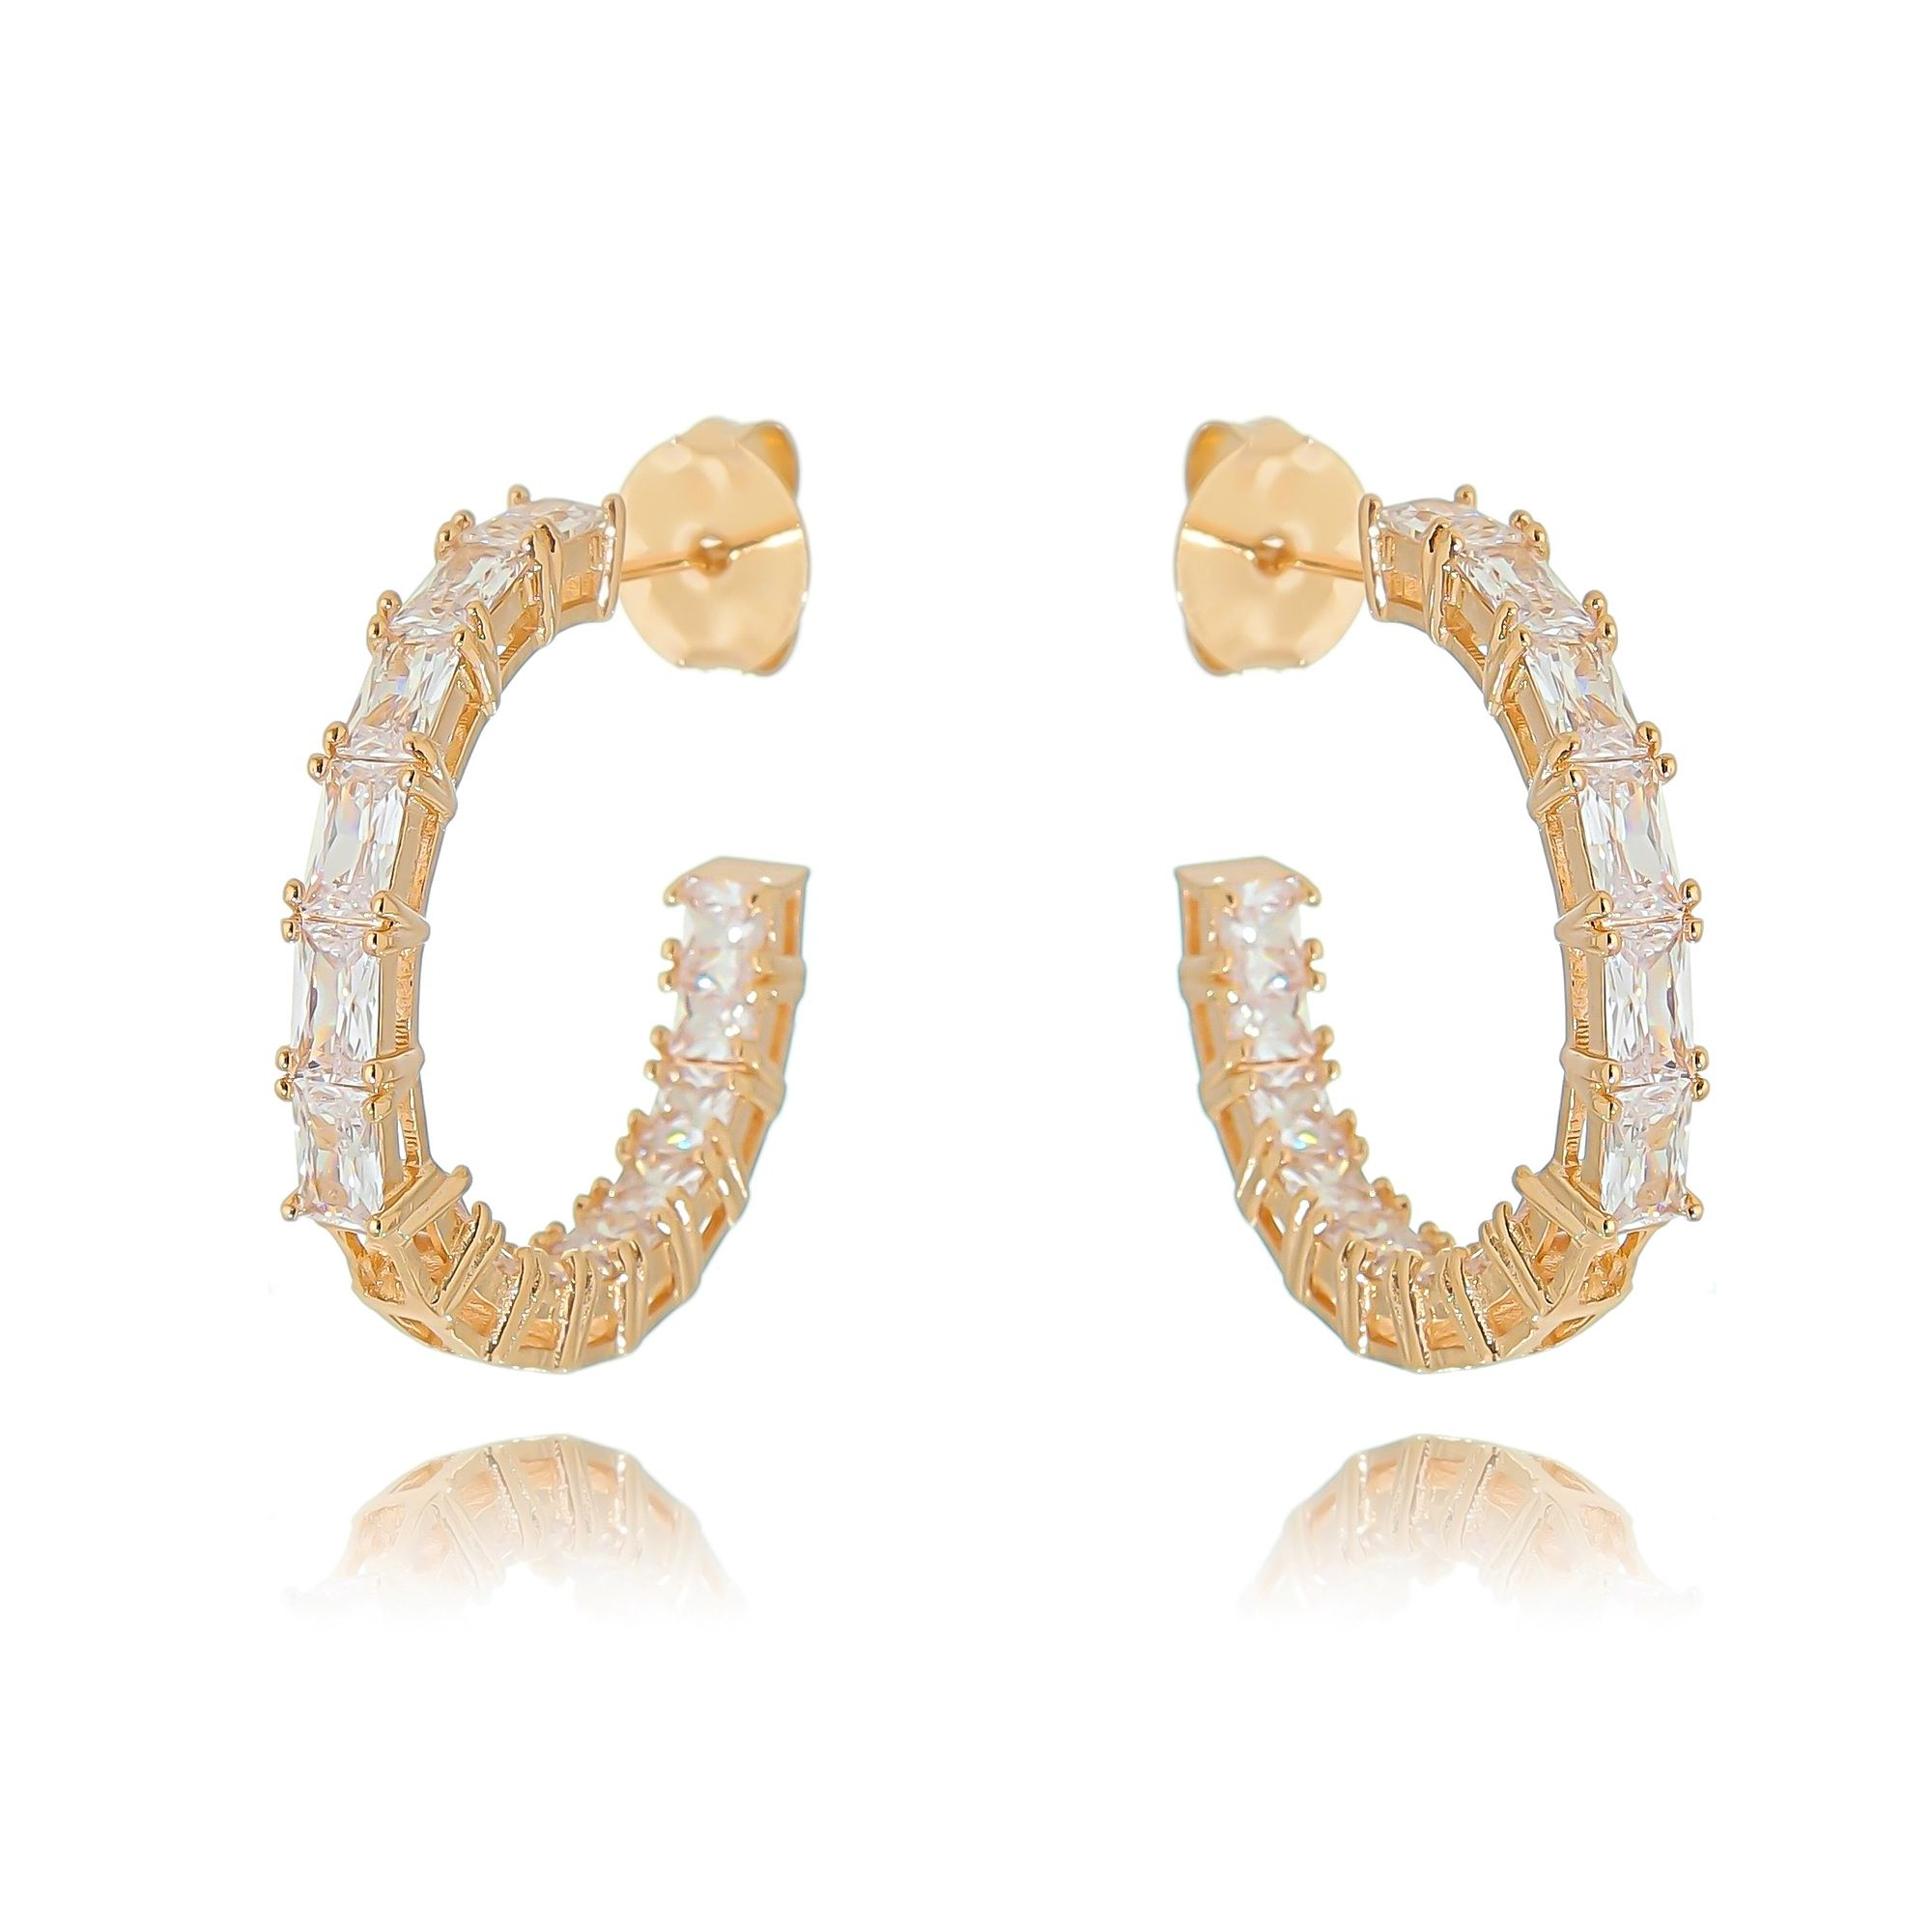 Argola Cristal Zircônia Ouro Rosé Semijoia Fashion  - Soloyou